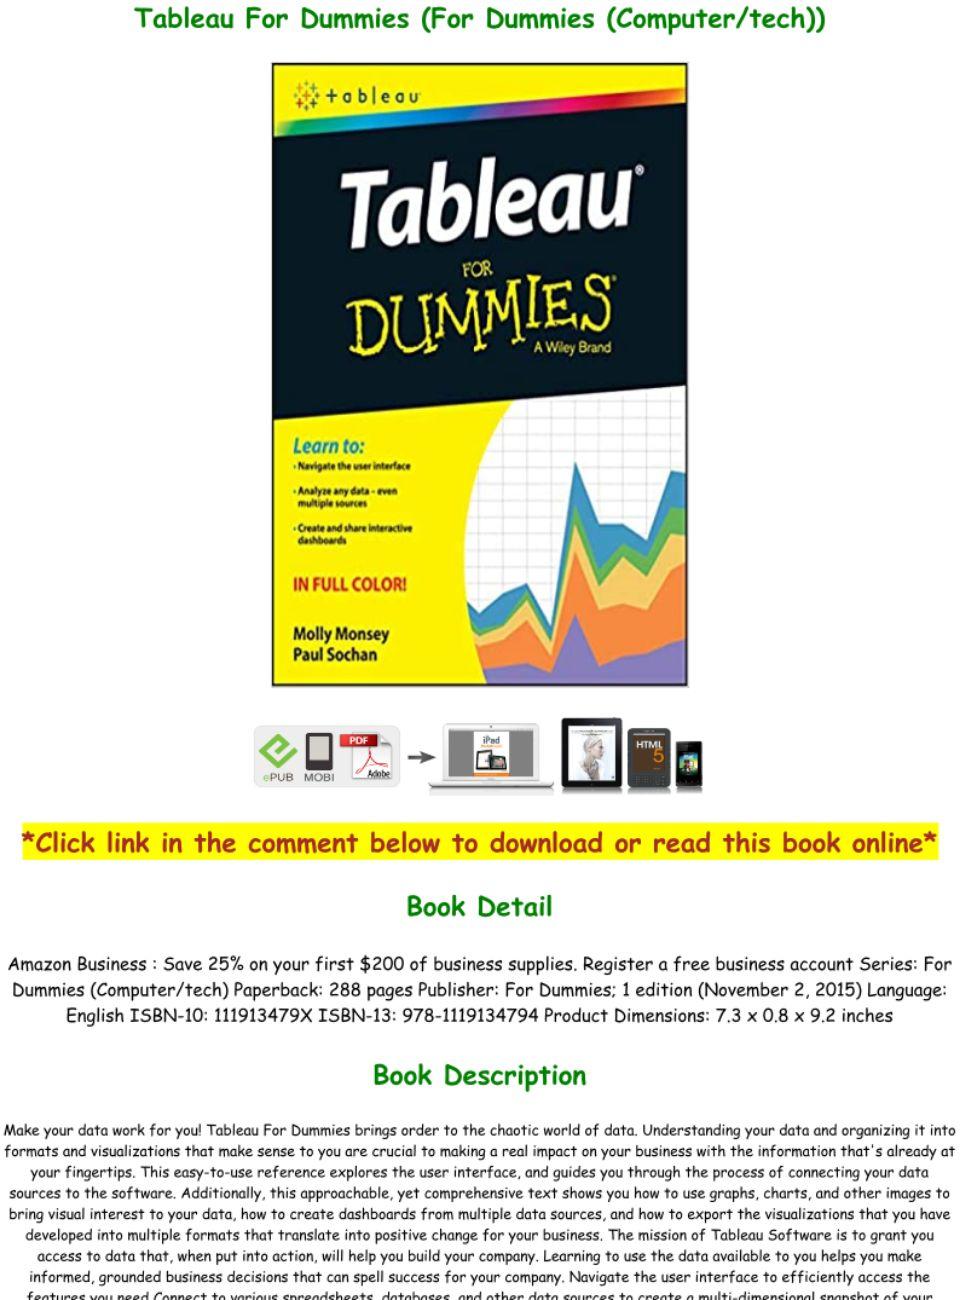 Tableau For Dummies Pdf Download